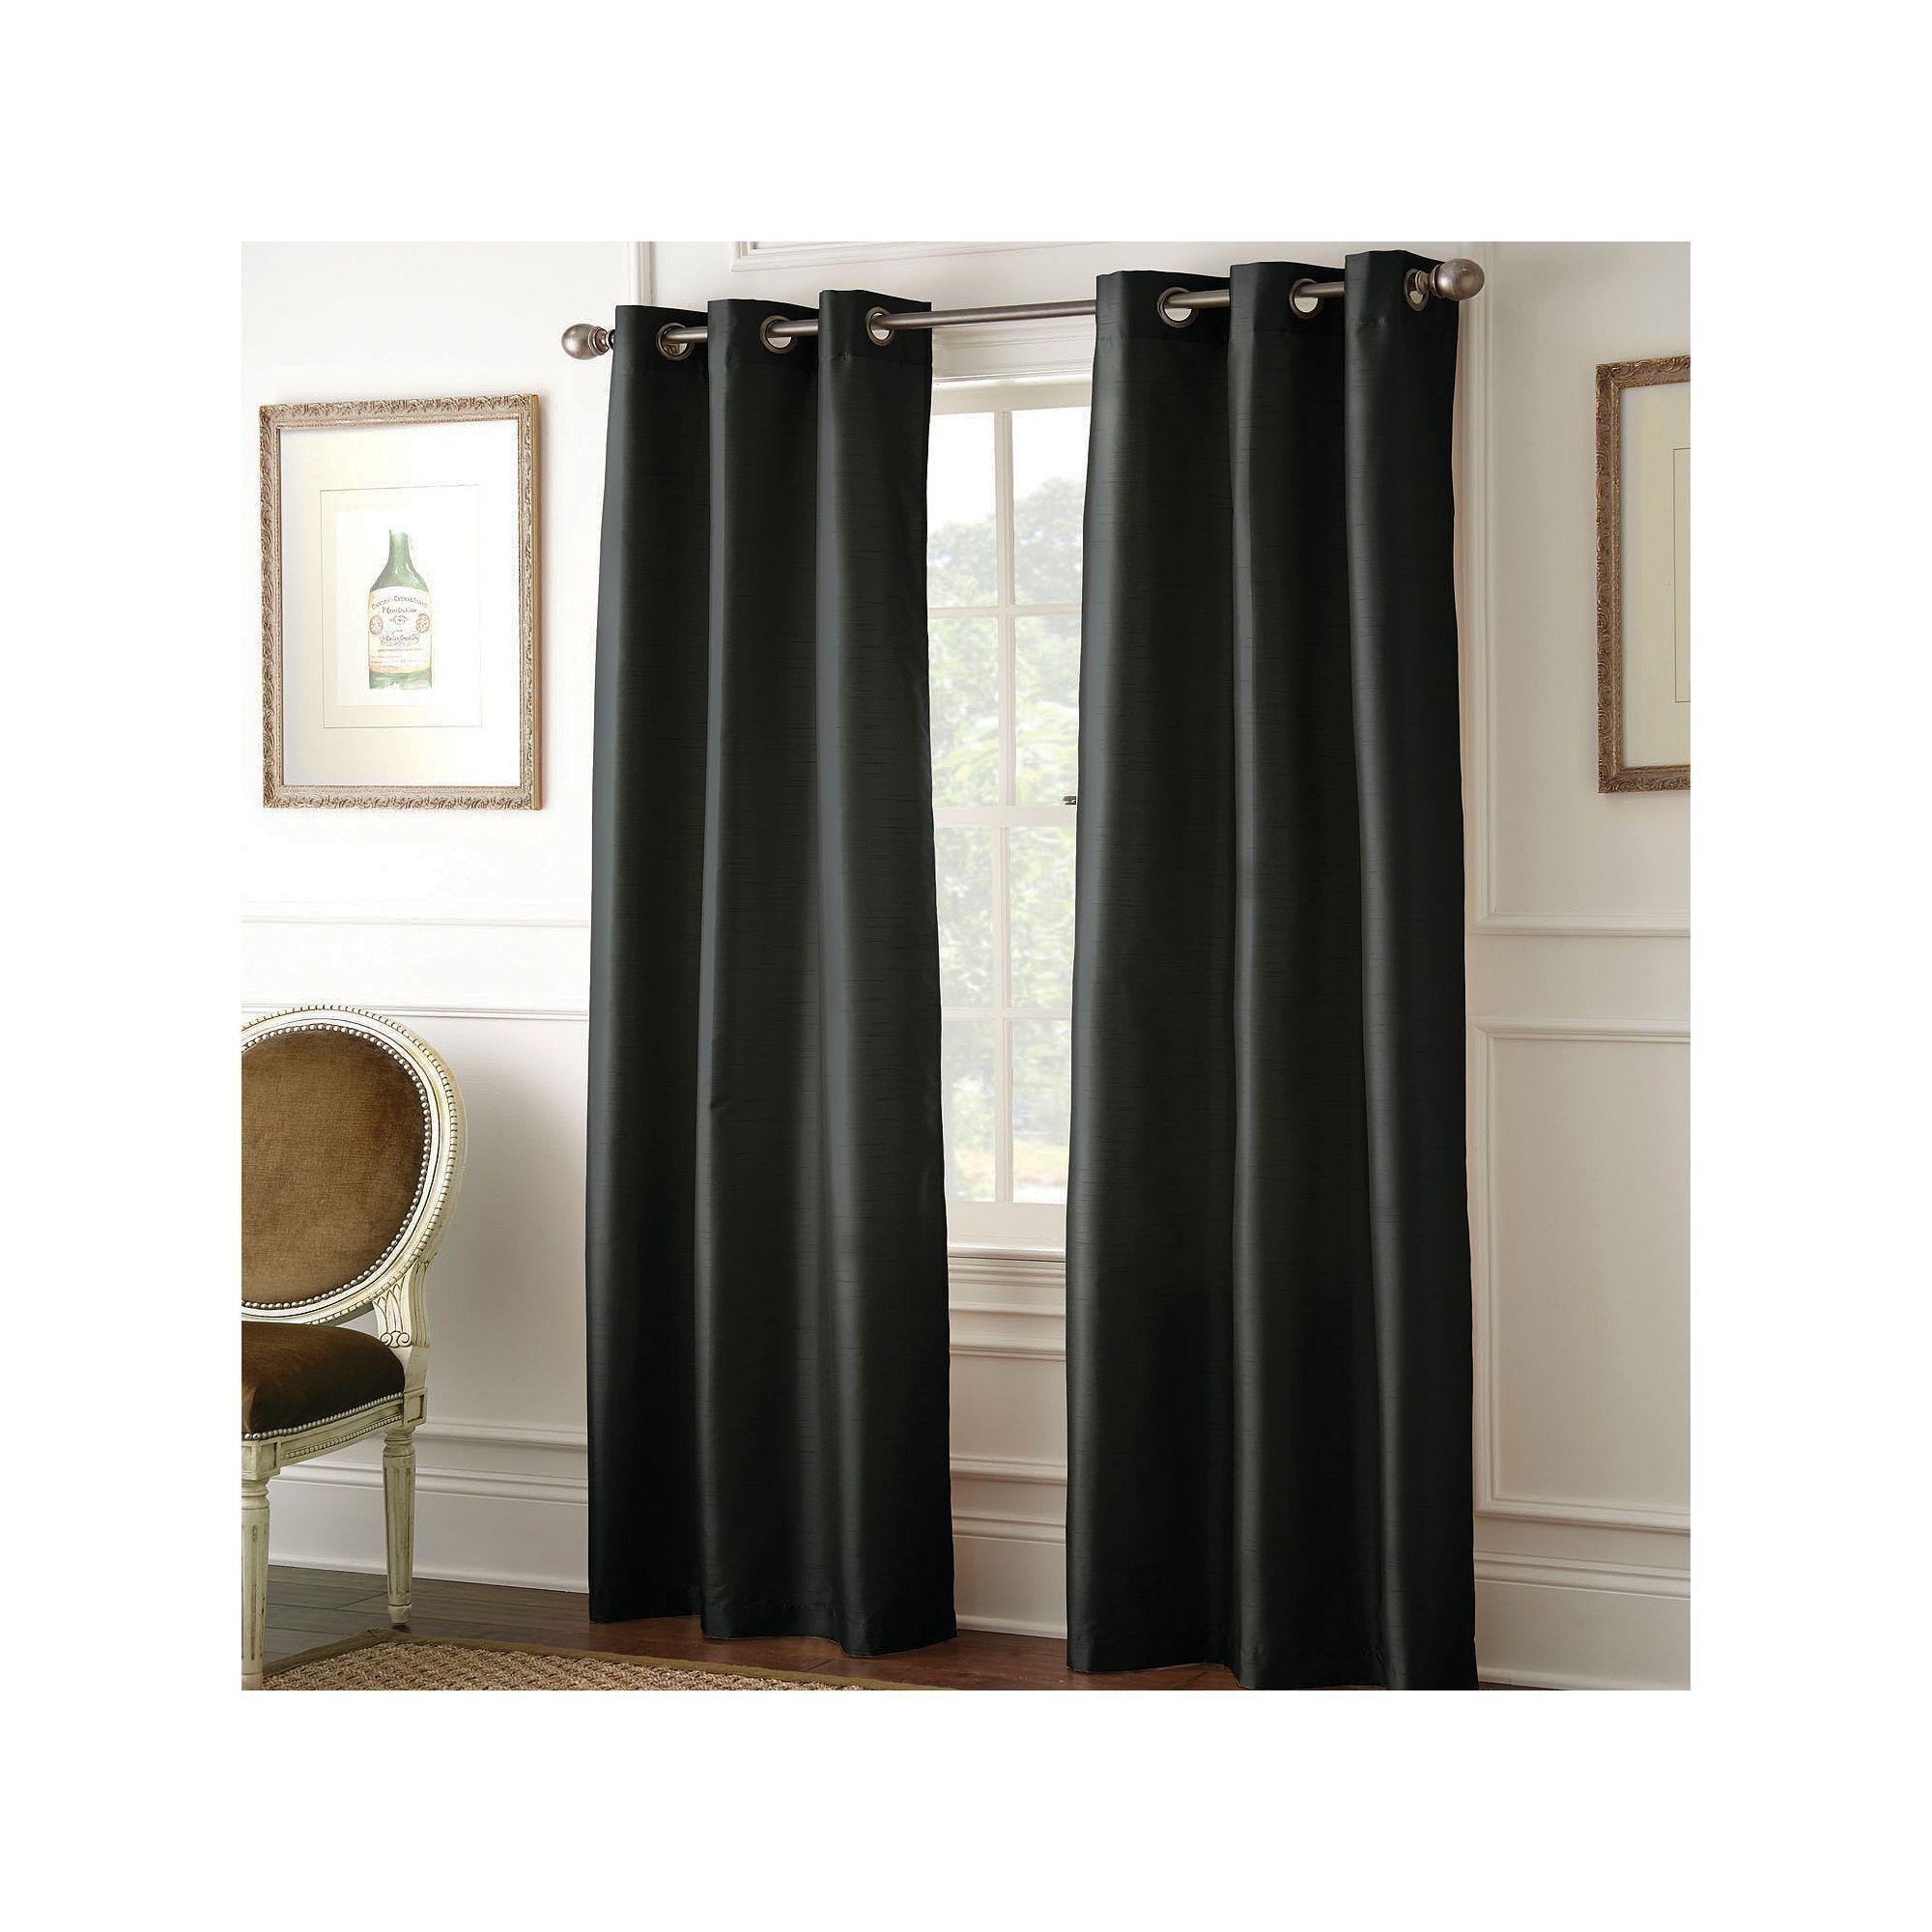 Pacific coast textiles pack shawn blackout curtains uu x